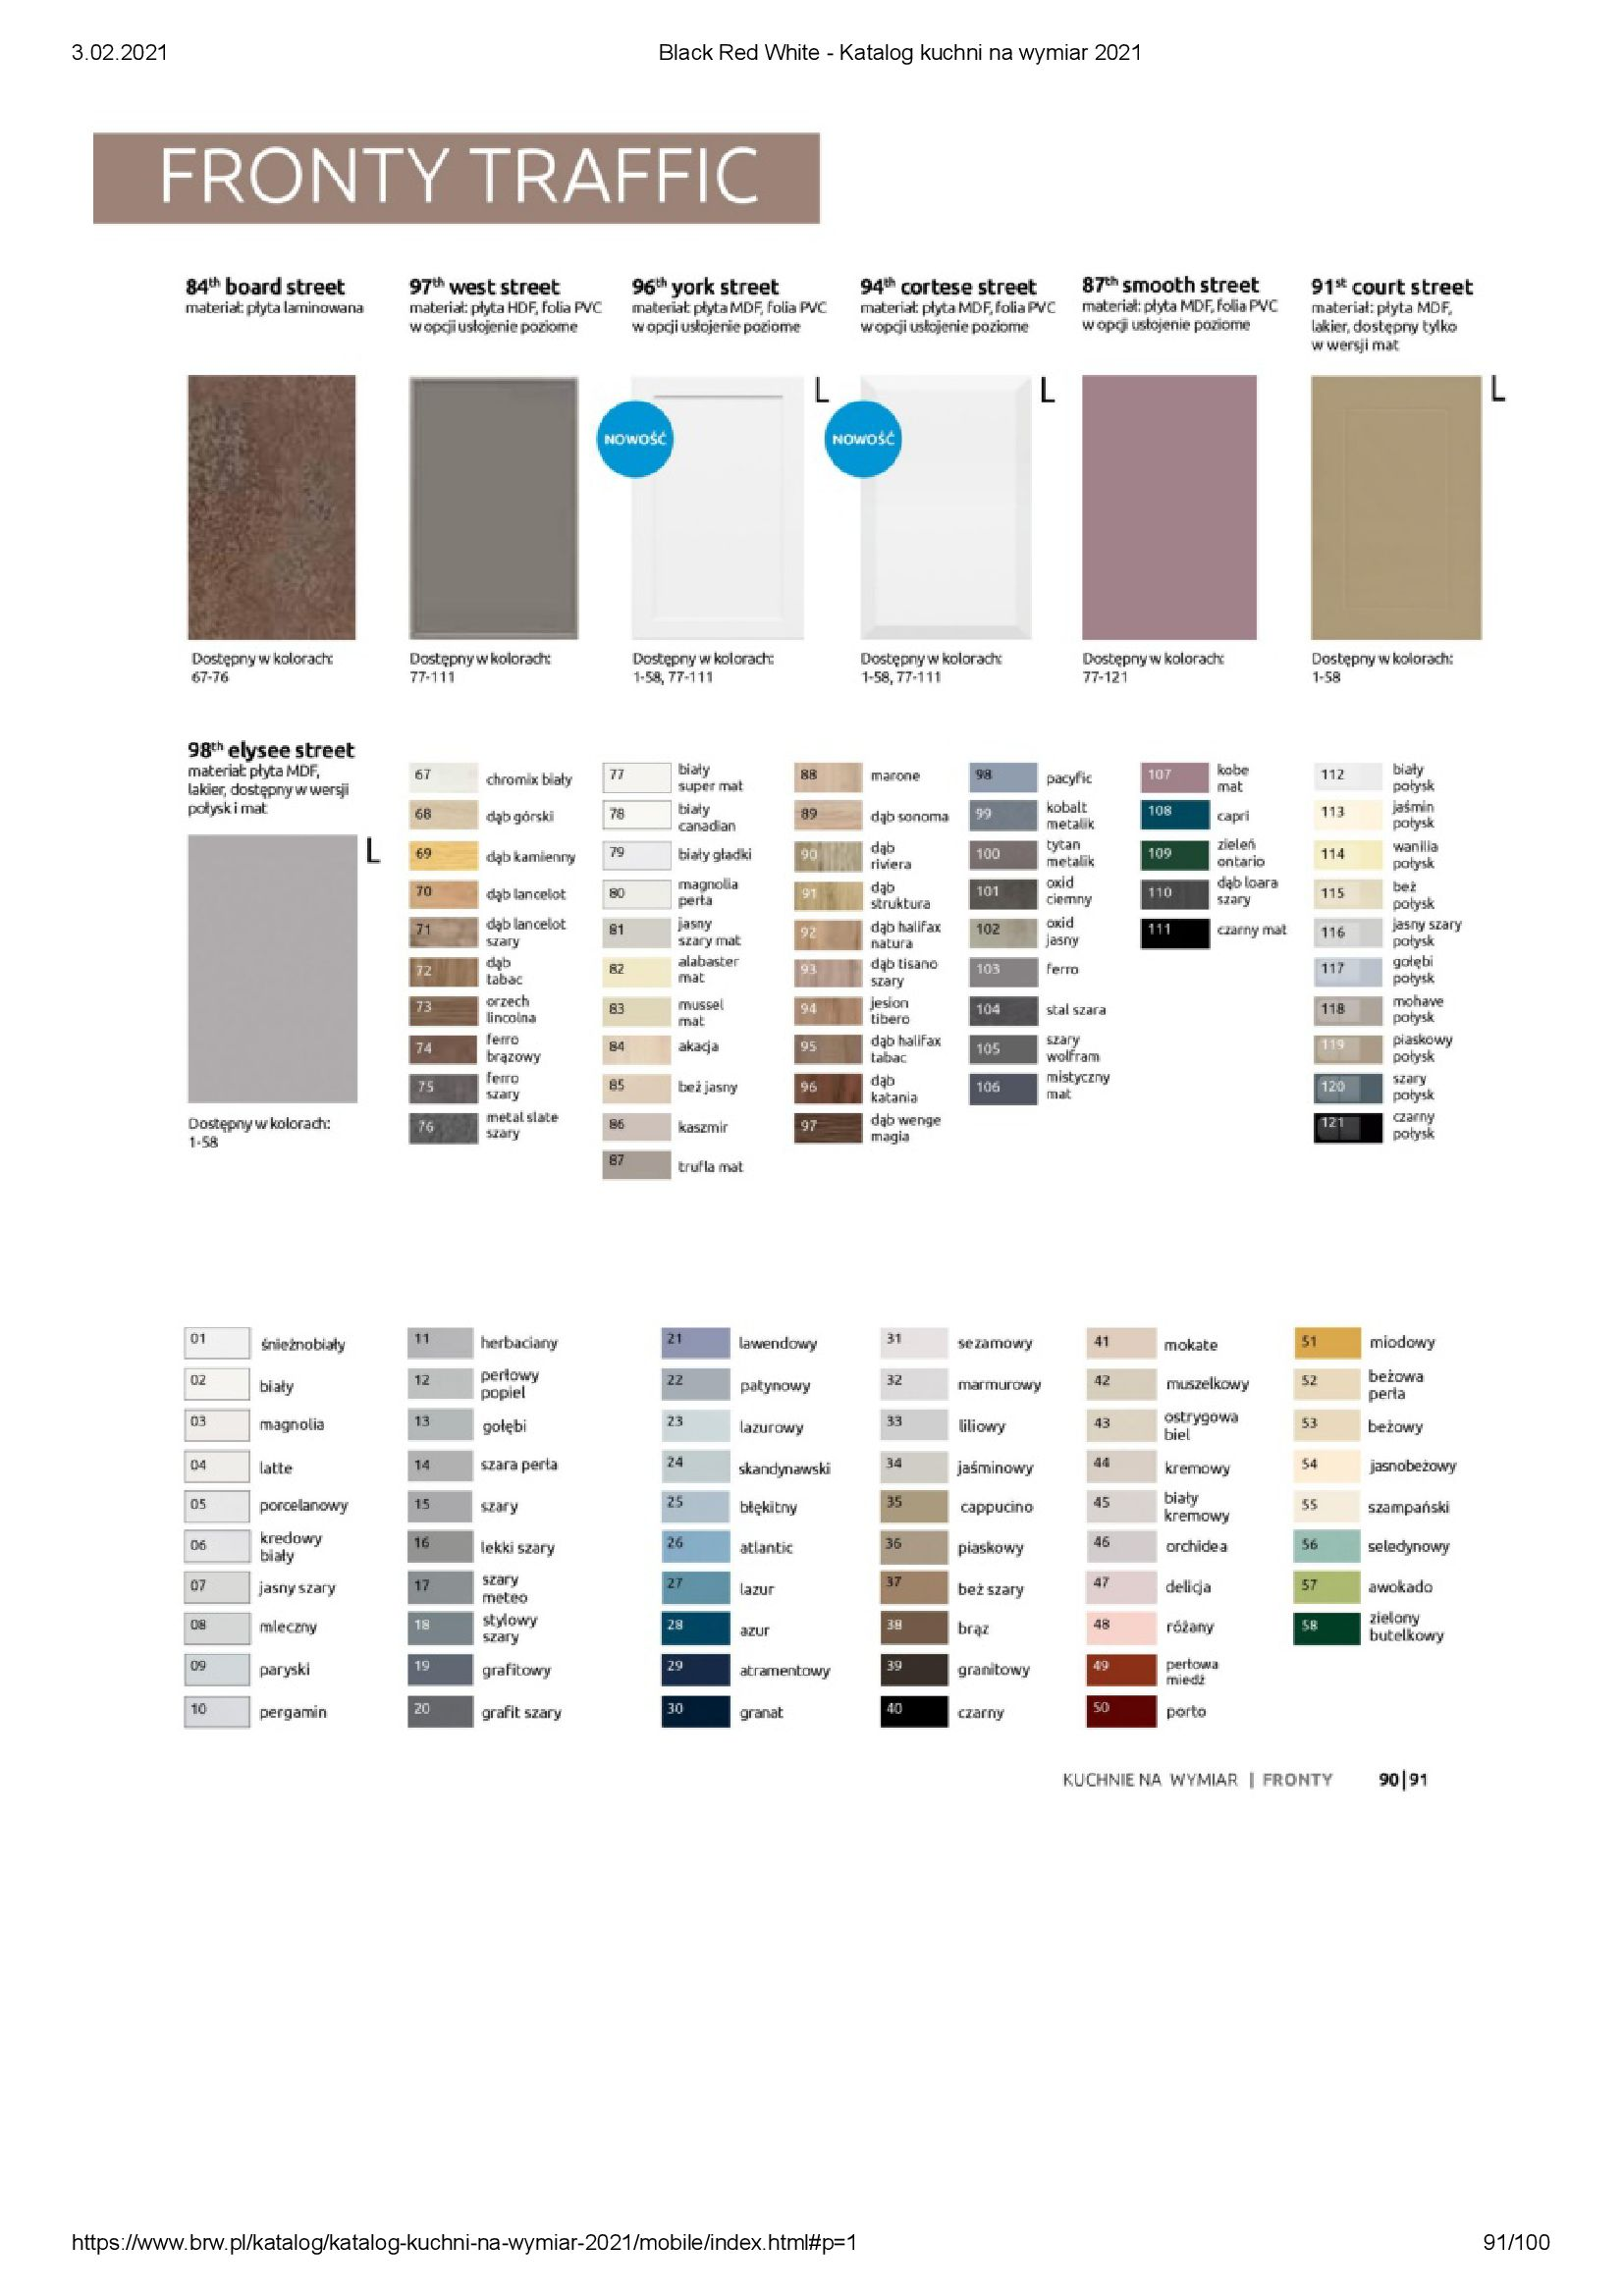 Gazetka Black Red White: Katalog - Kuchnie na wymiar Senso Kitchens 2021 2021-01-01 page-91